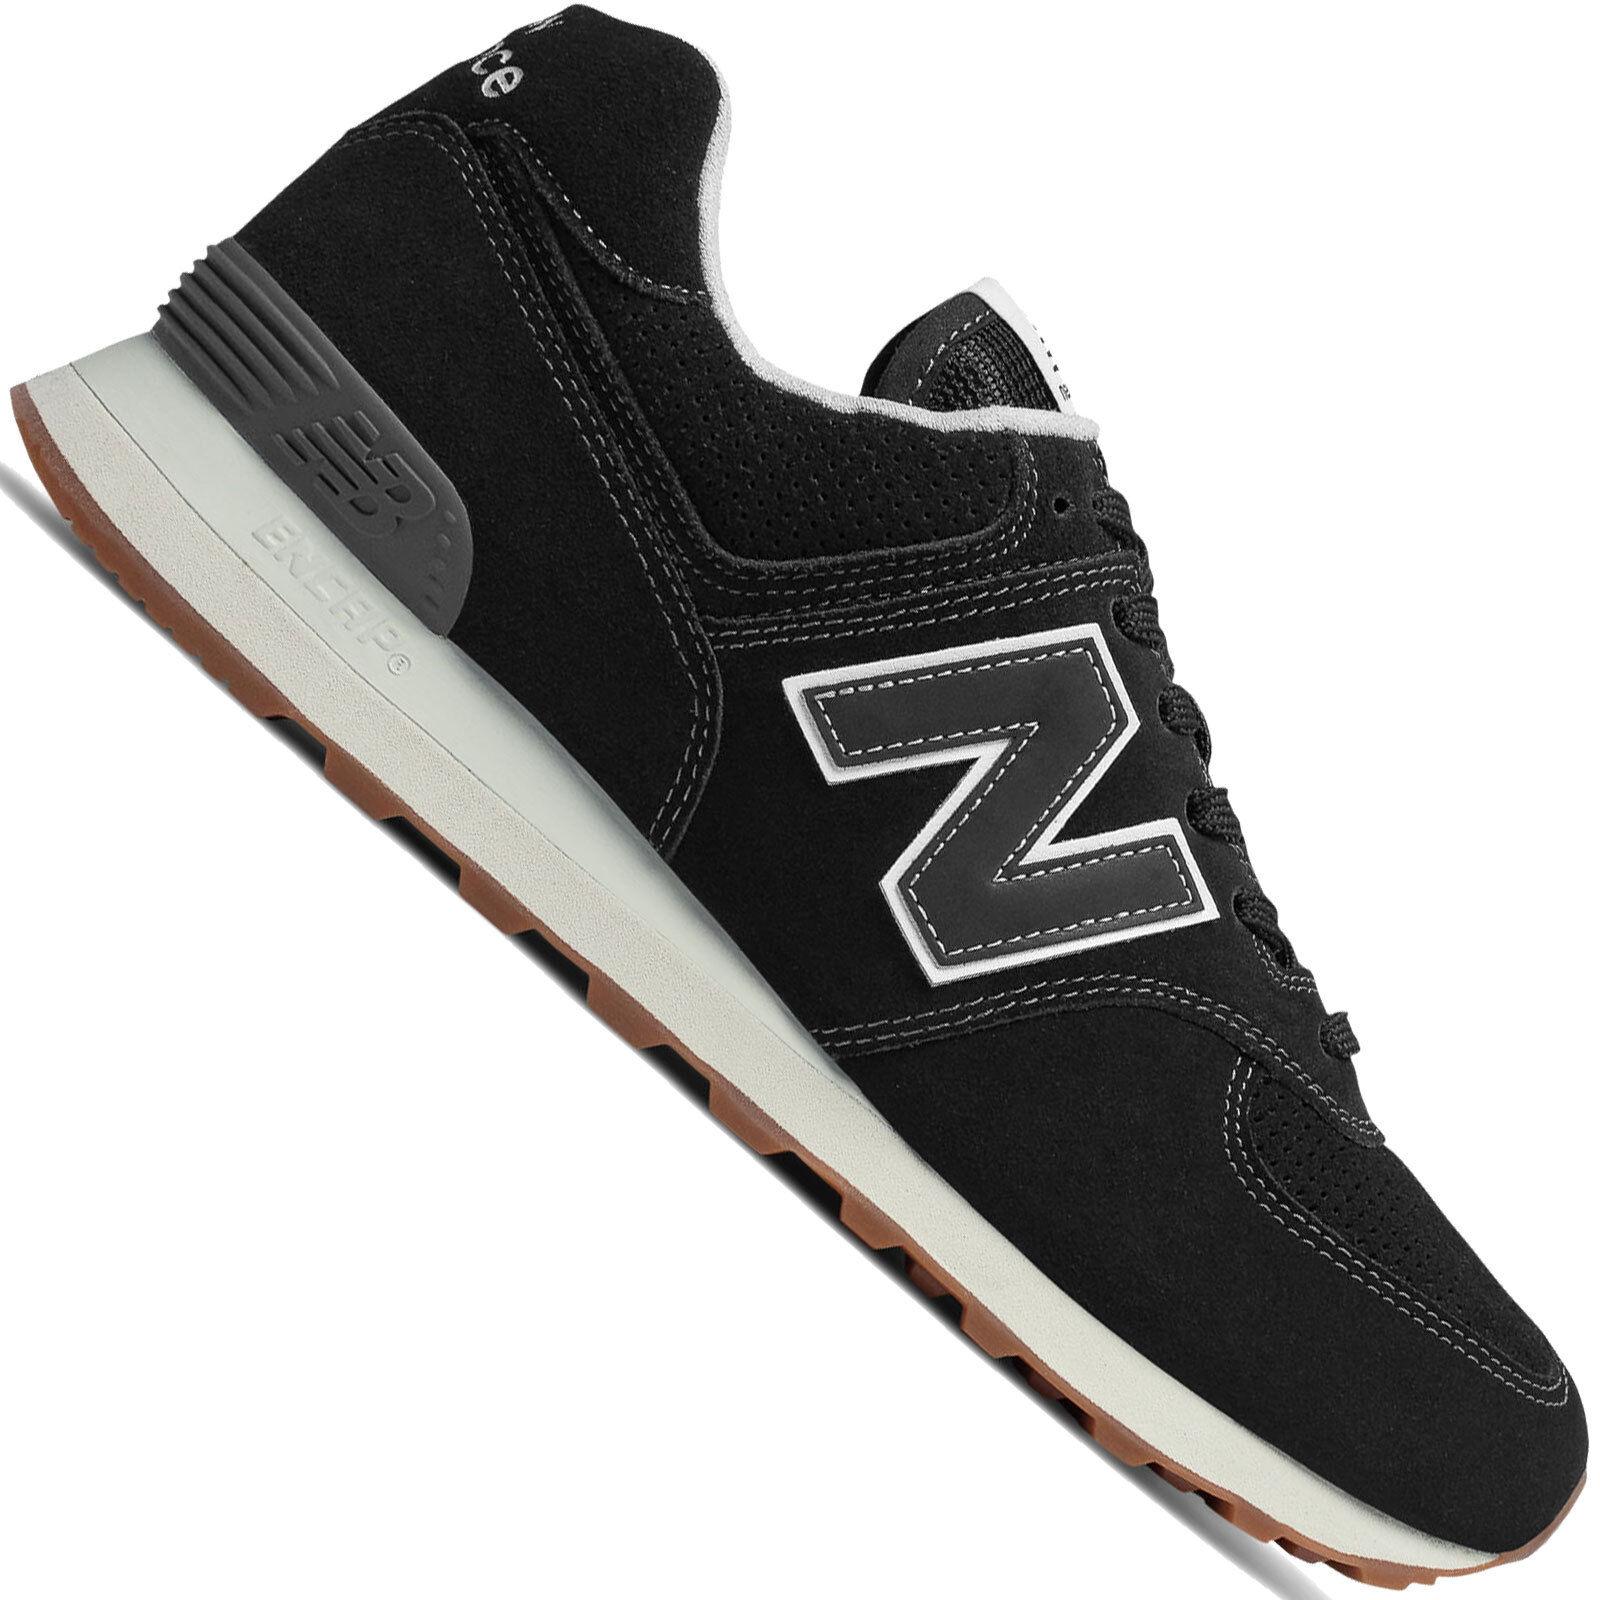 nouveau solde derempa ml 373 grigio chaussures derempa solde argento ml373gre basket 4677f6